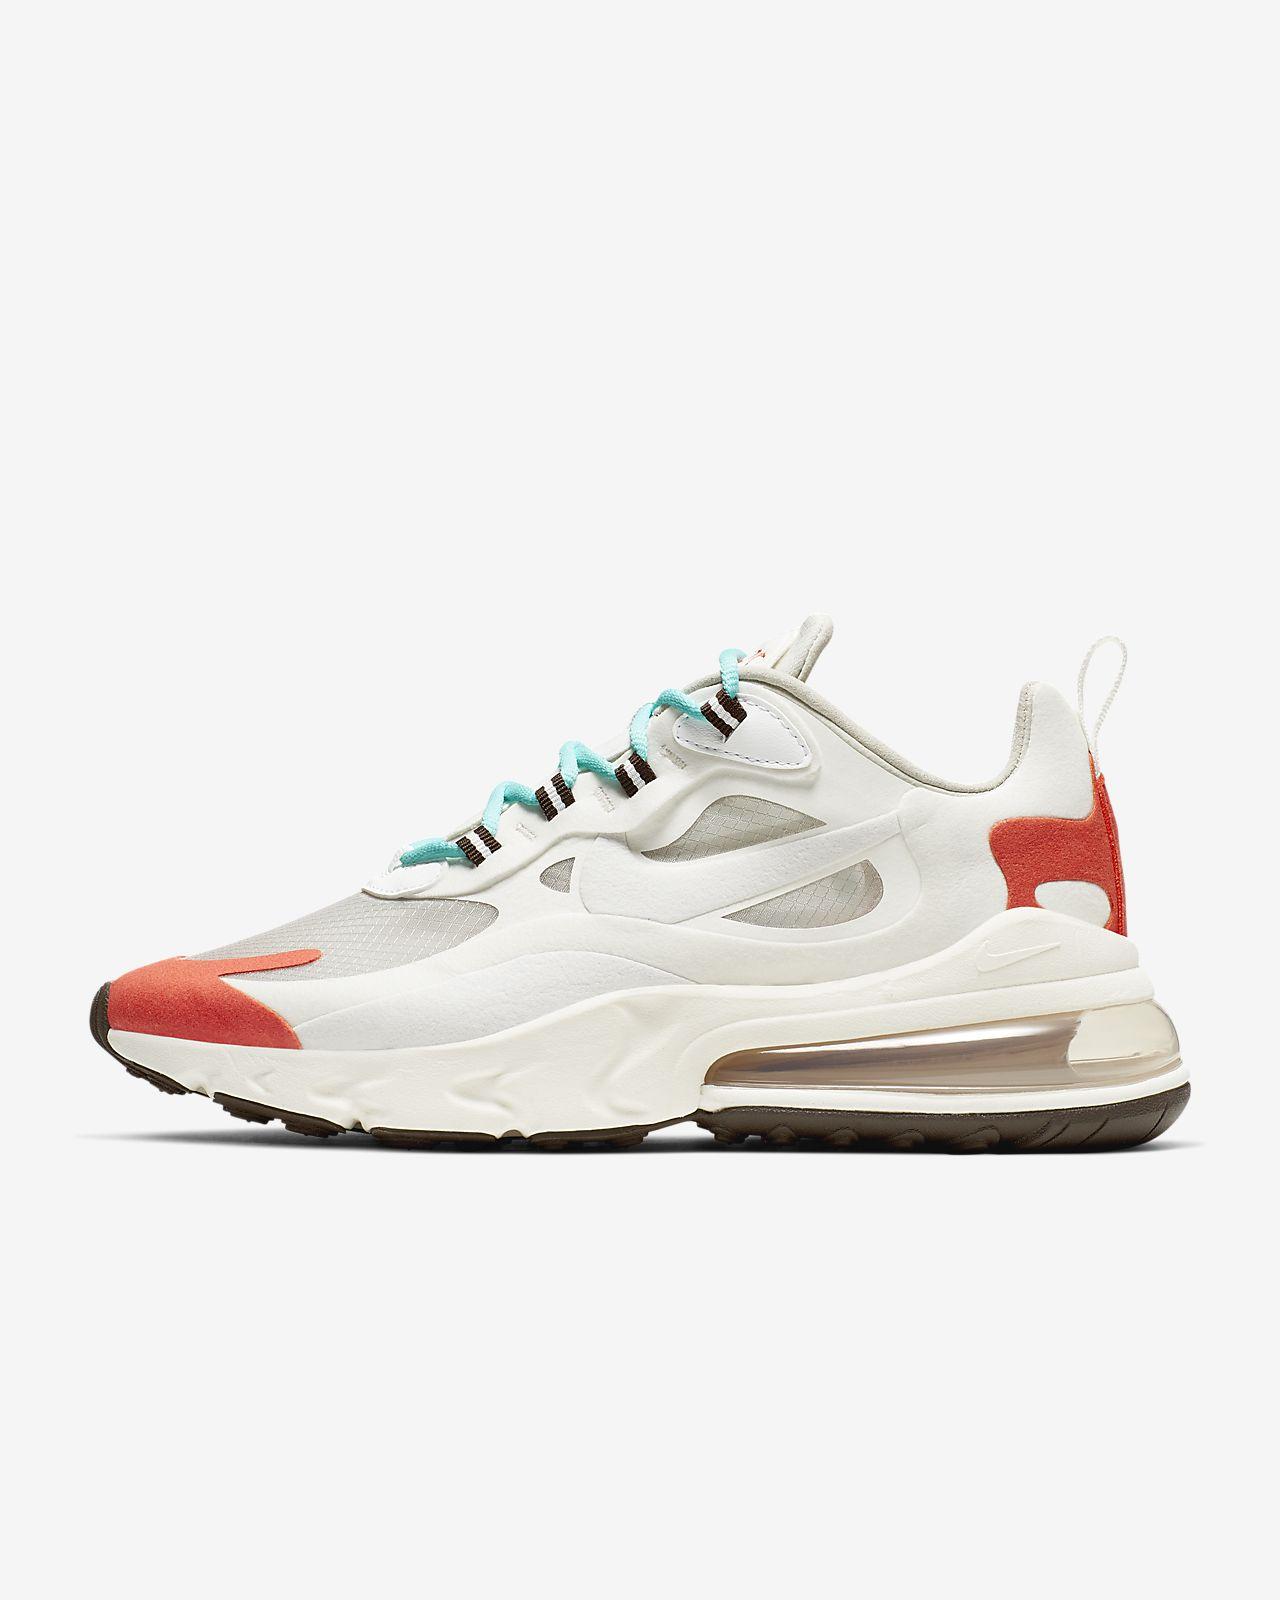 Nike Air Max 270 React (Mid-Century) Women's Shoe